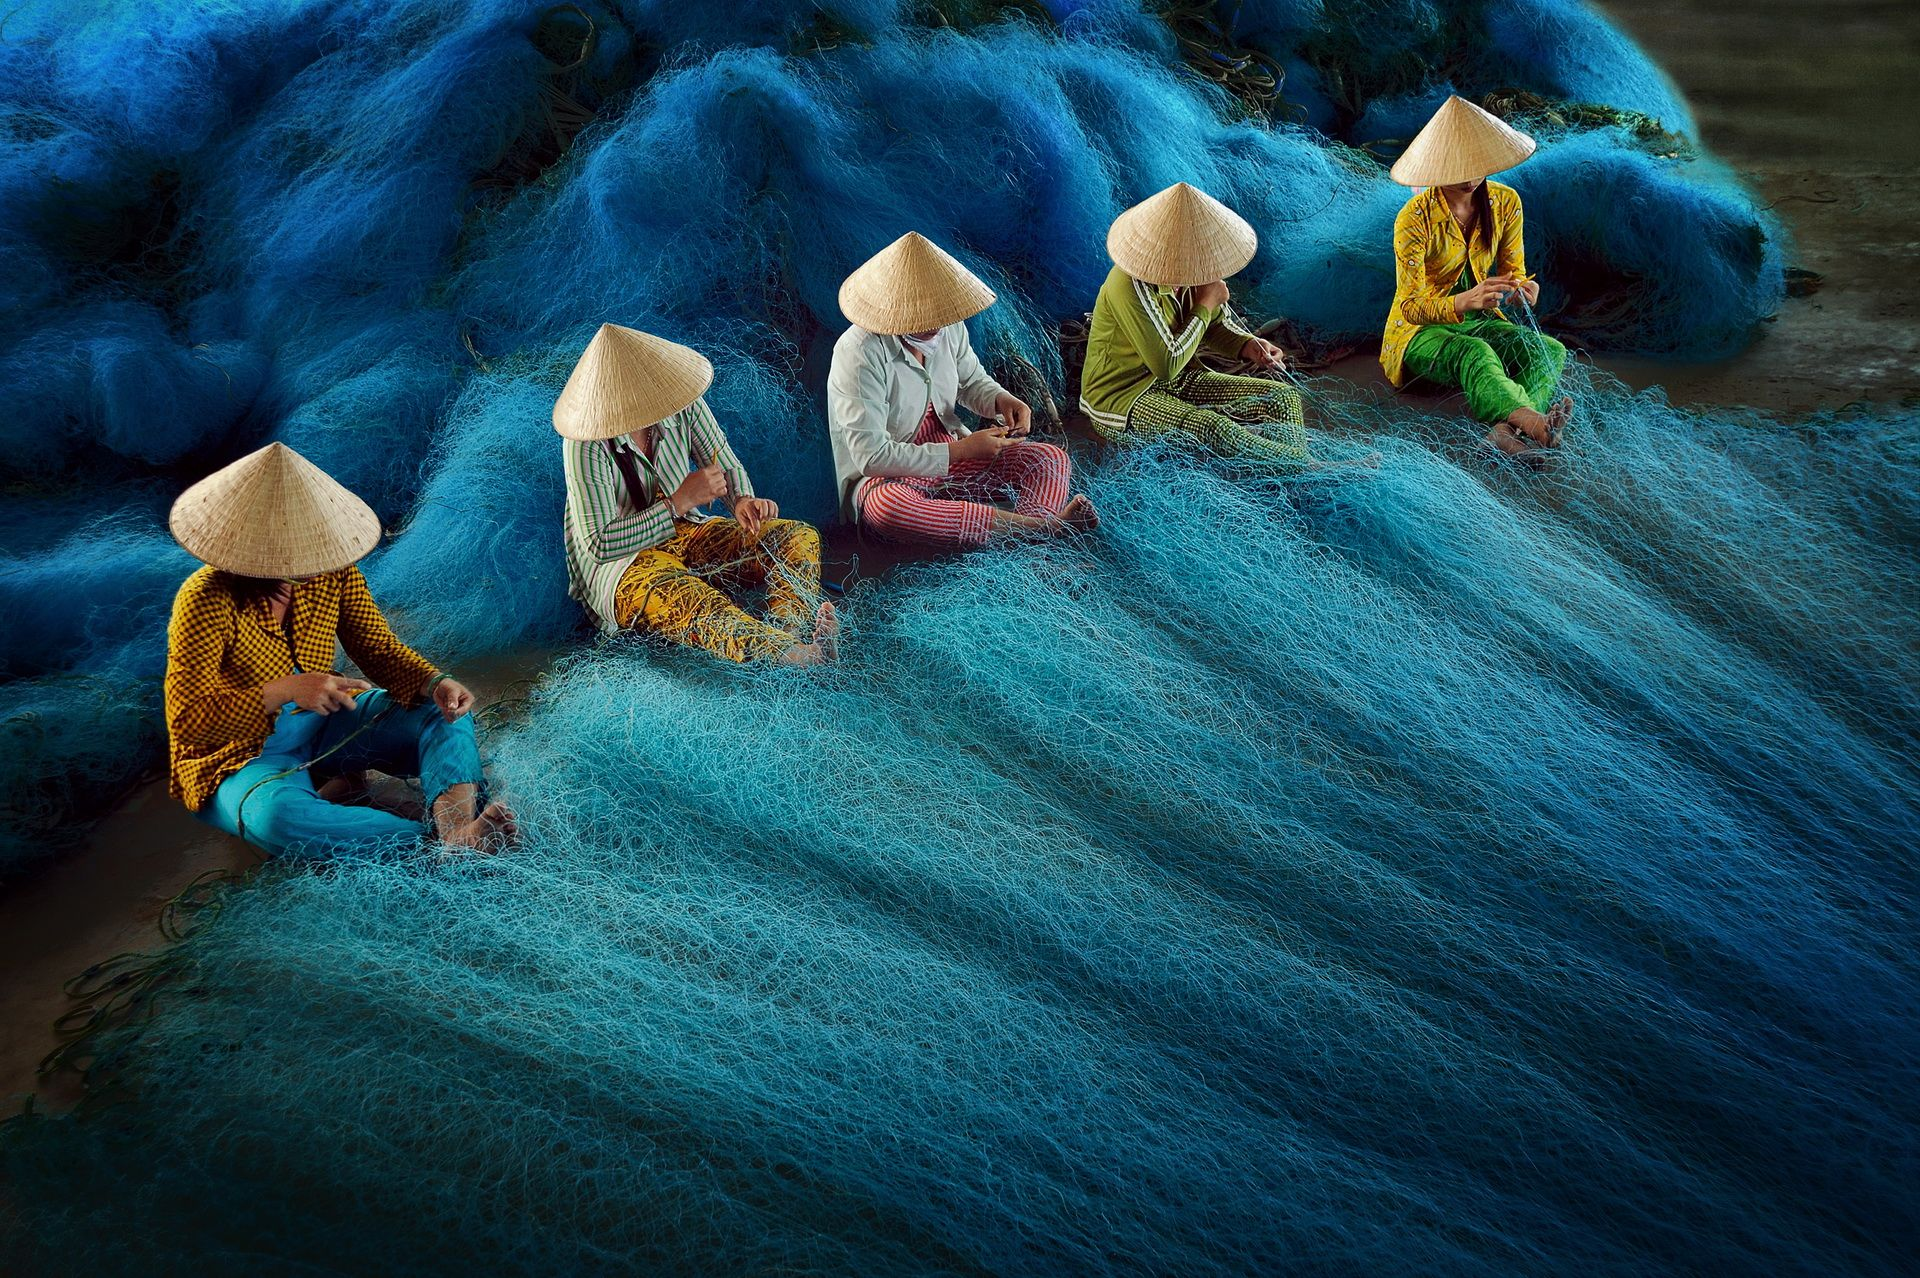 net-mending-hoang-long-ly-vietnam